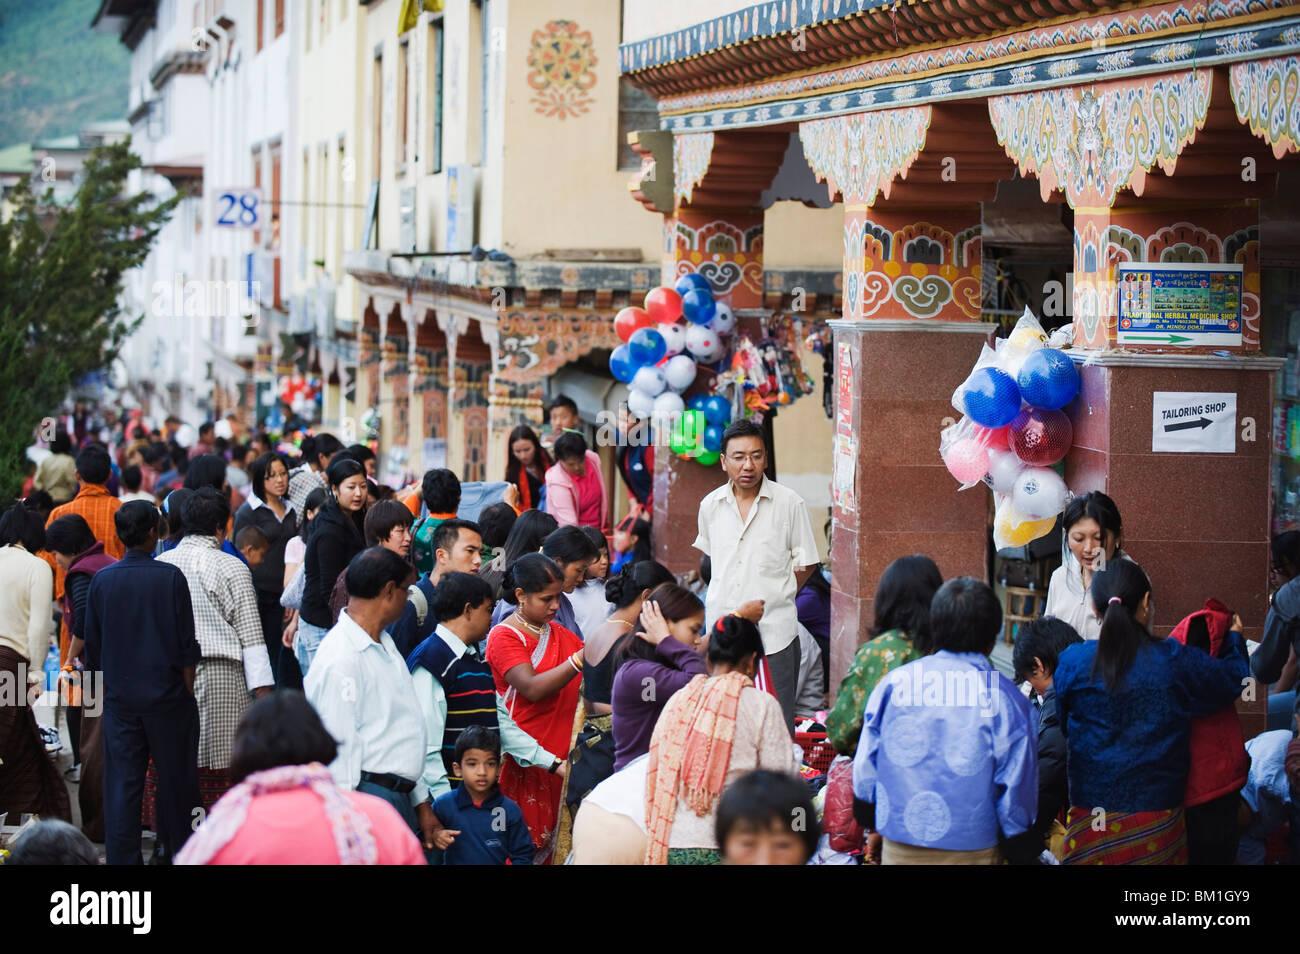 Festival period street market, Thimphu, Bhutan, Asia - Stock Image